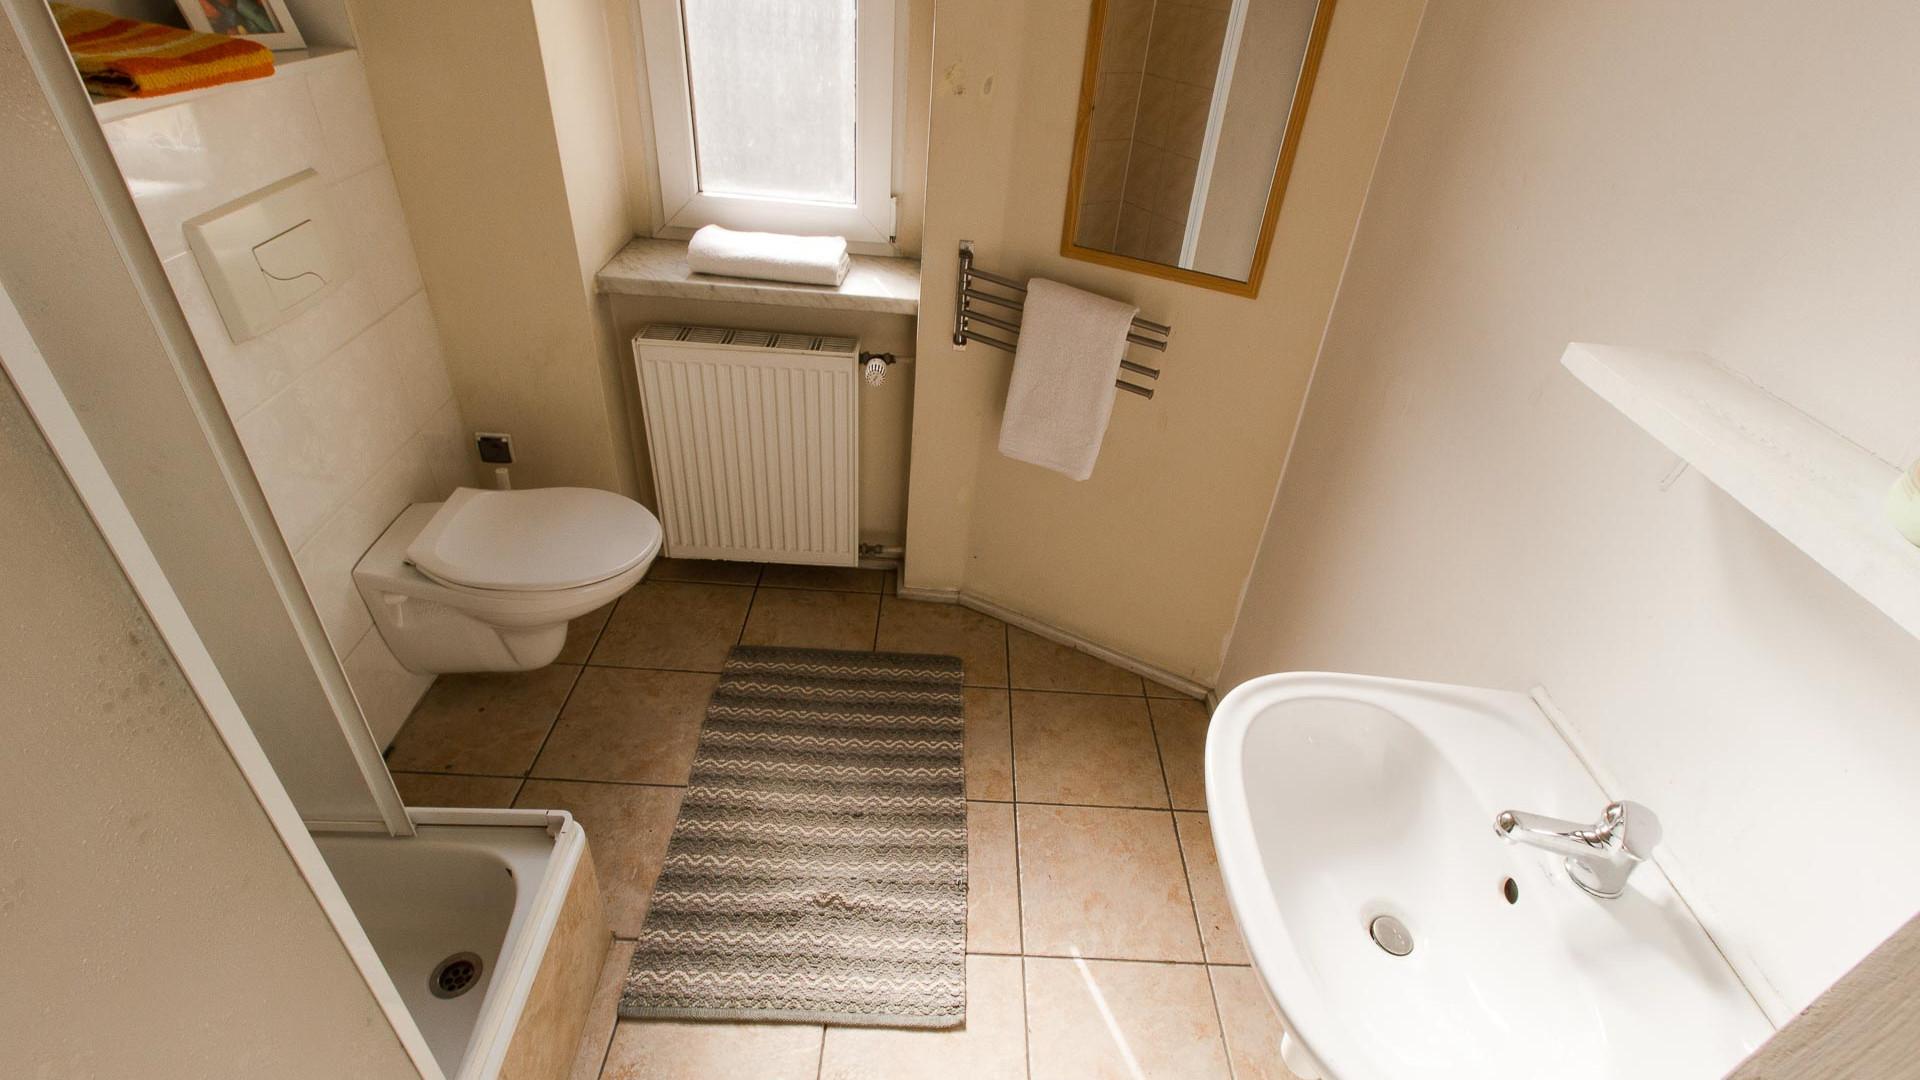 Apartment 6 7 8 osob Poznan Old Town (7